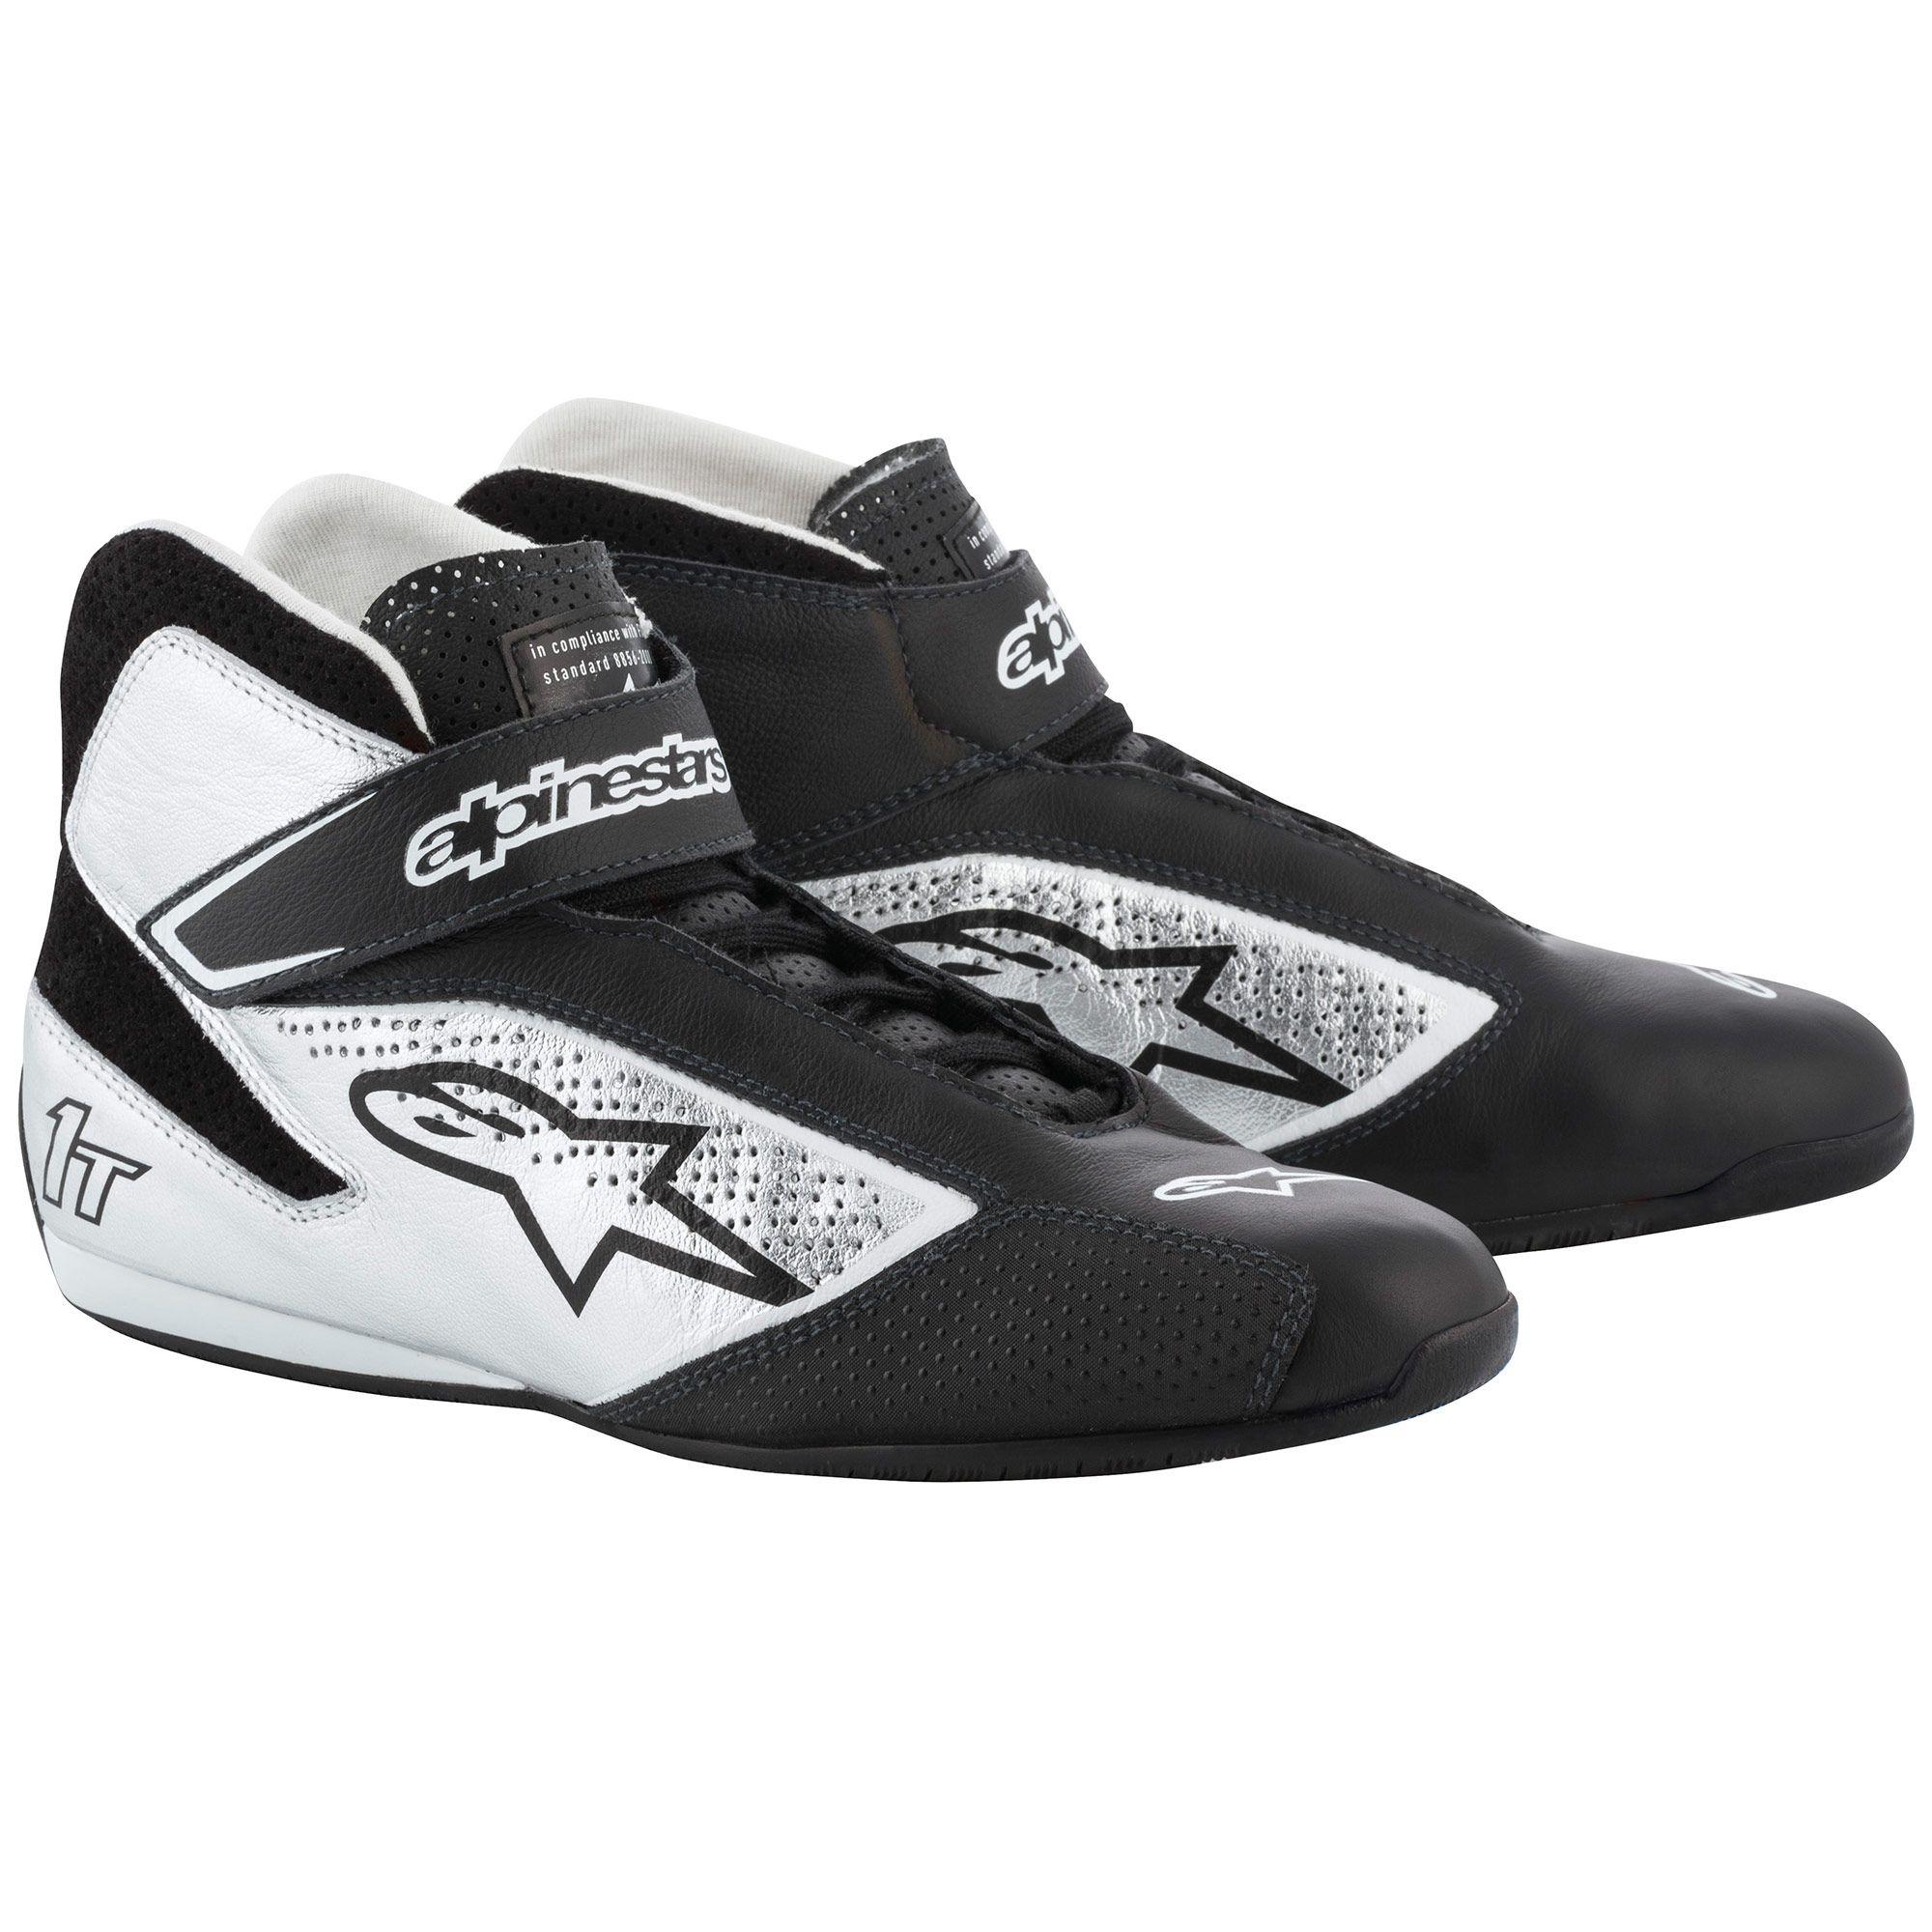 Alpinestars Tech 1-T Race Shoes black/silver